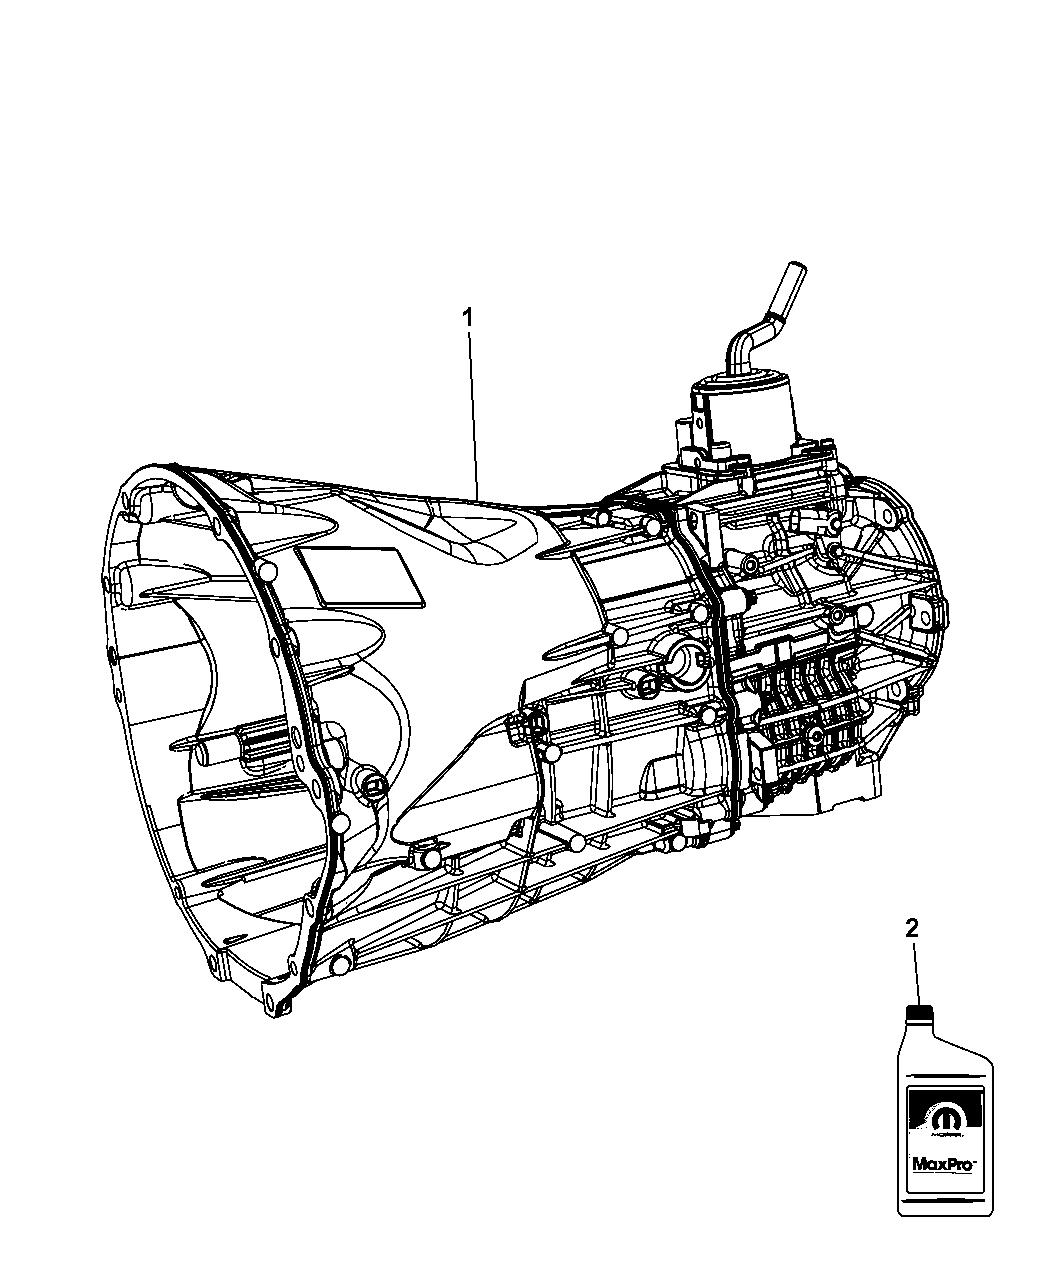 2010 jeep wrangler transmission / transaxle assembly